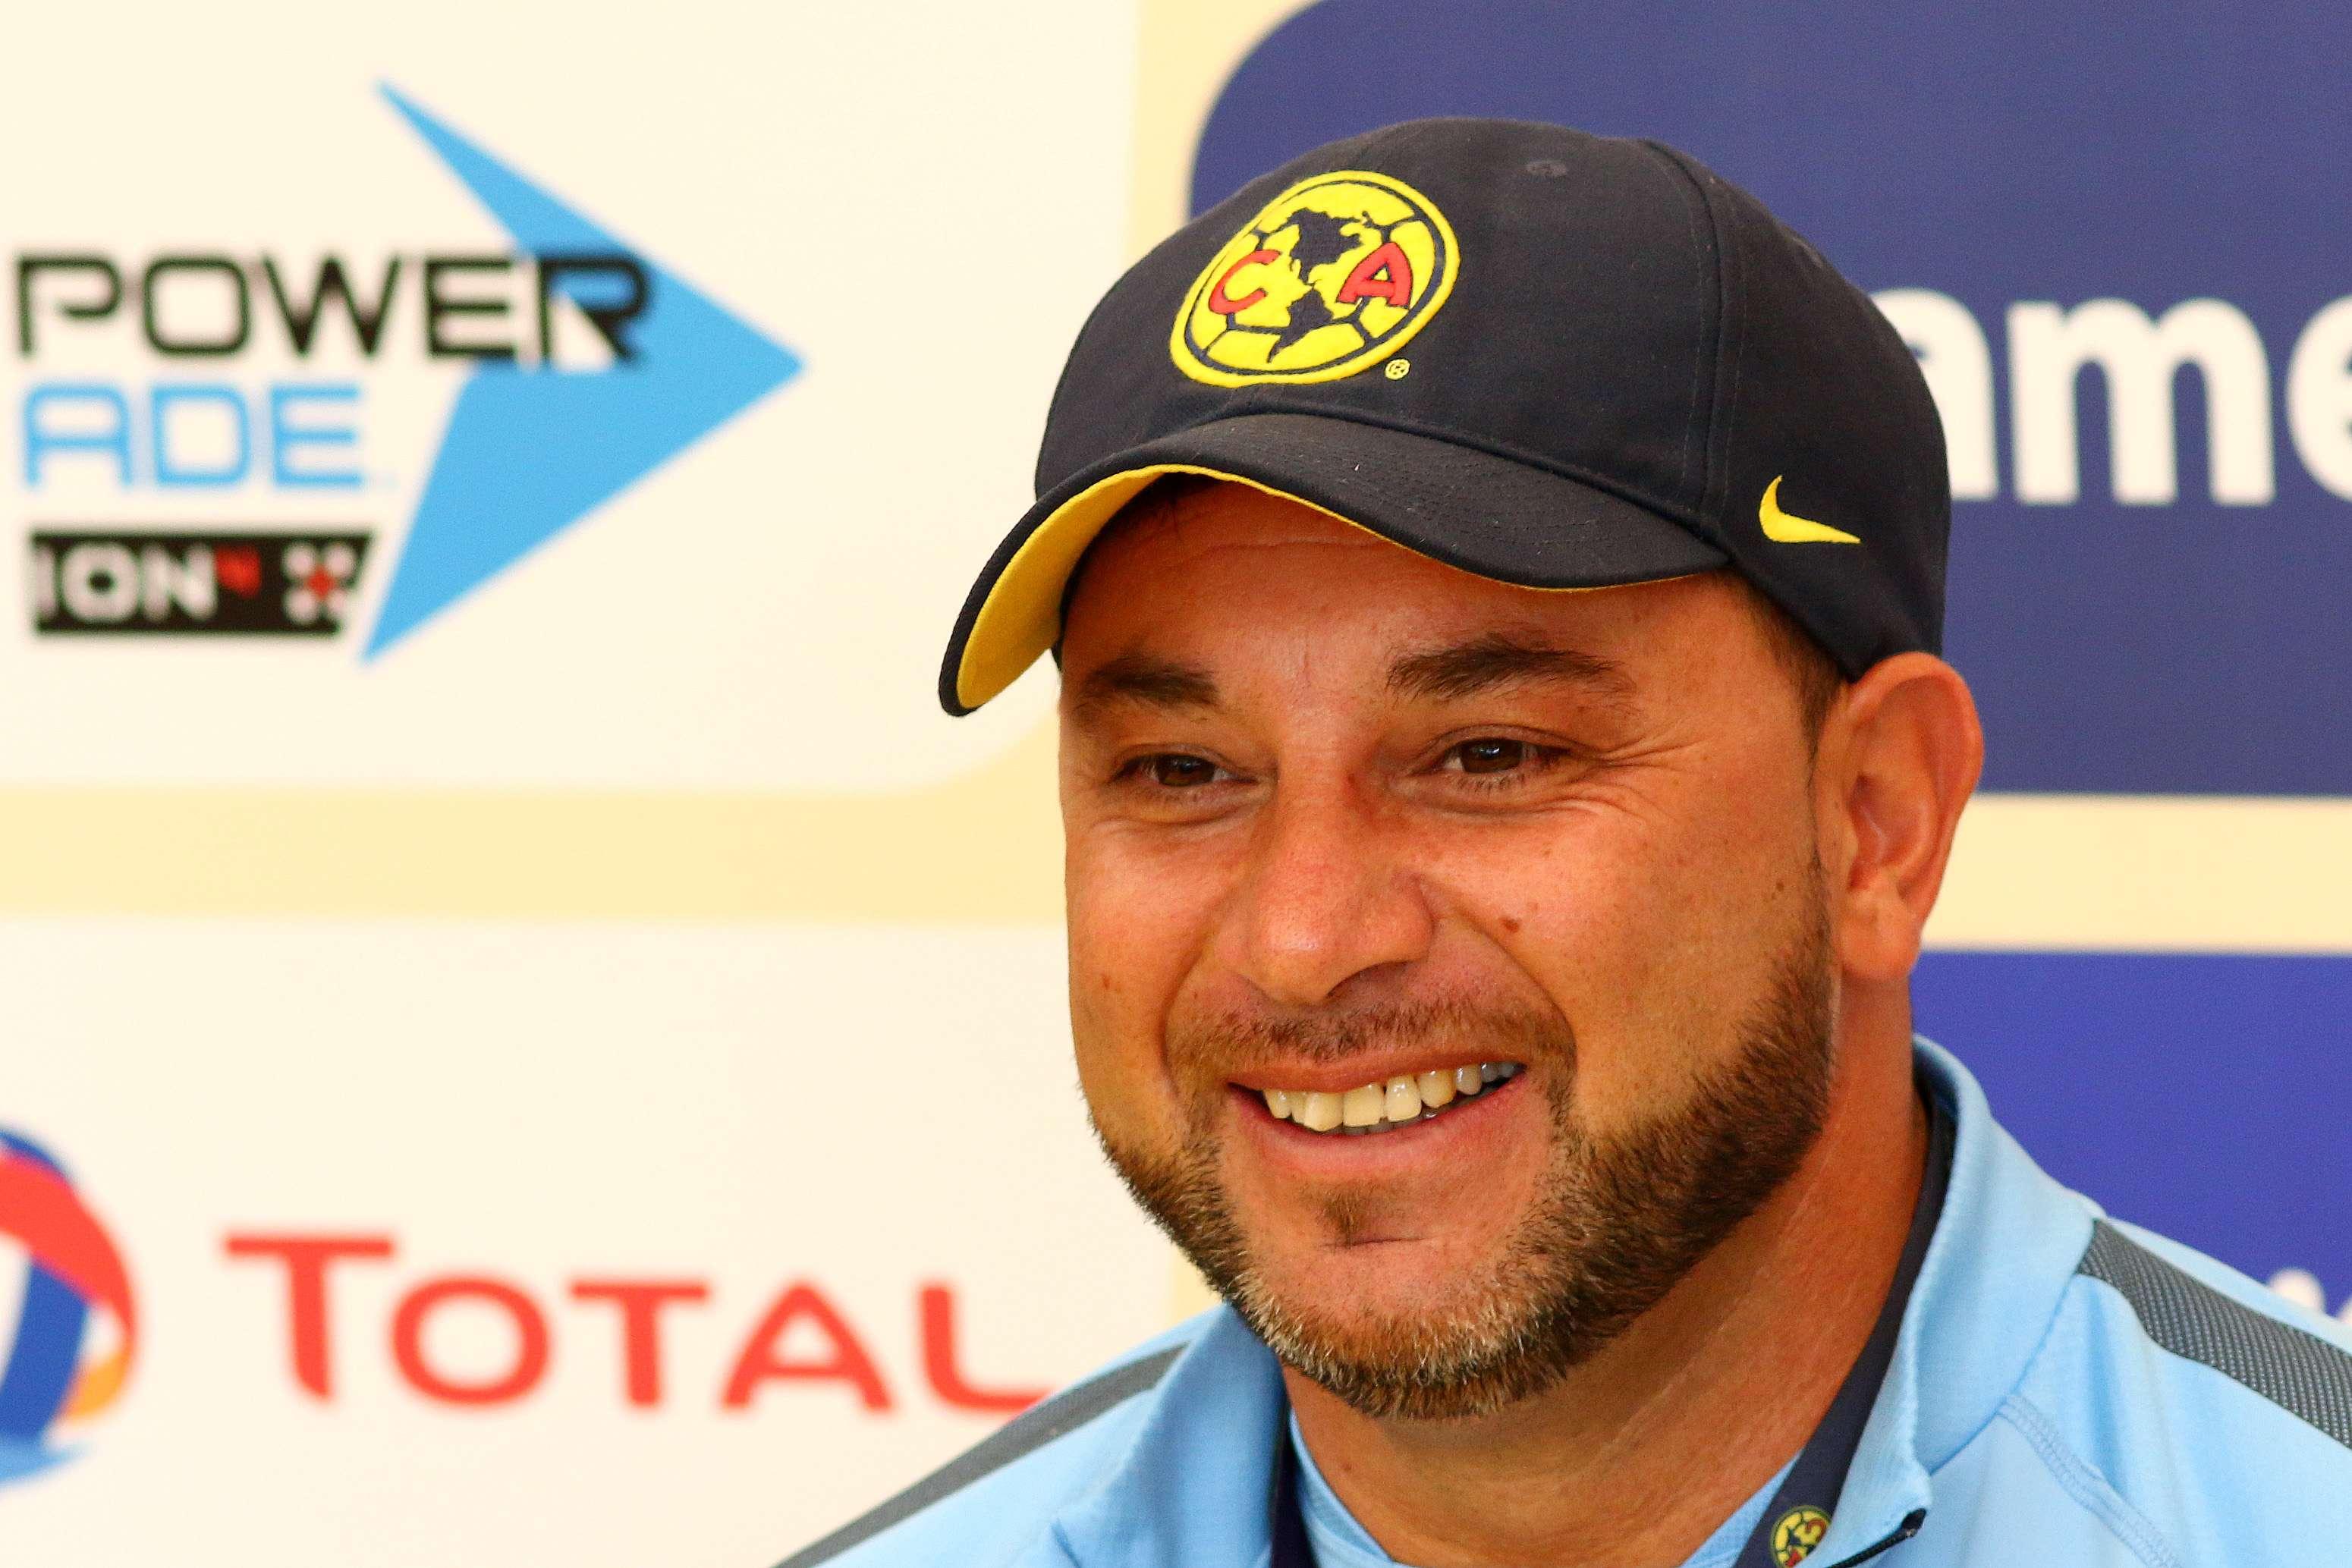 Mohamed evitó hablar del mal momento de Chivas. Foto: imago7